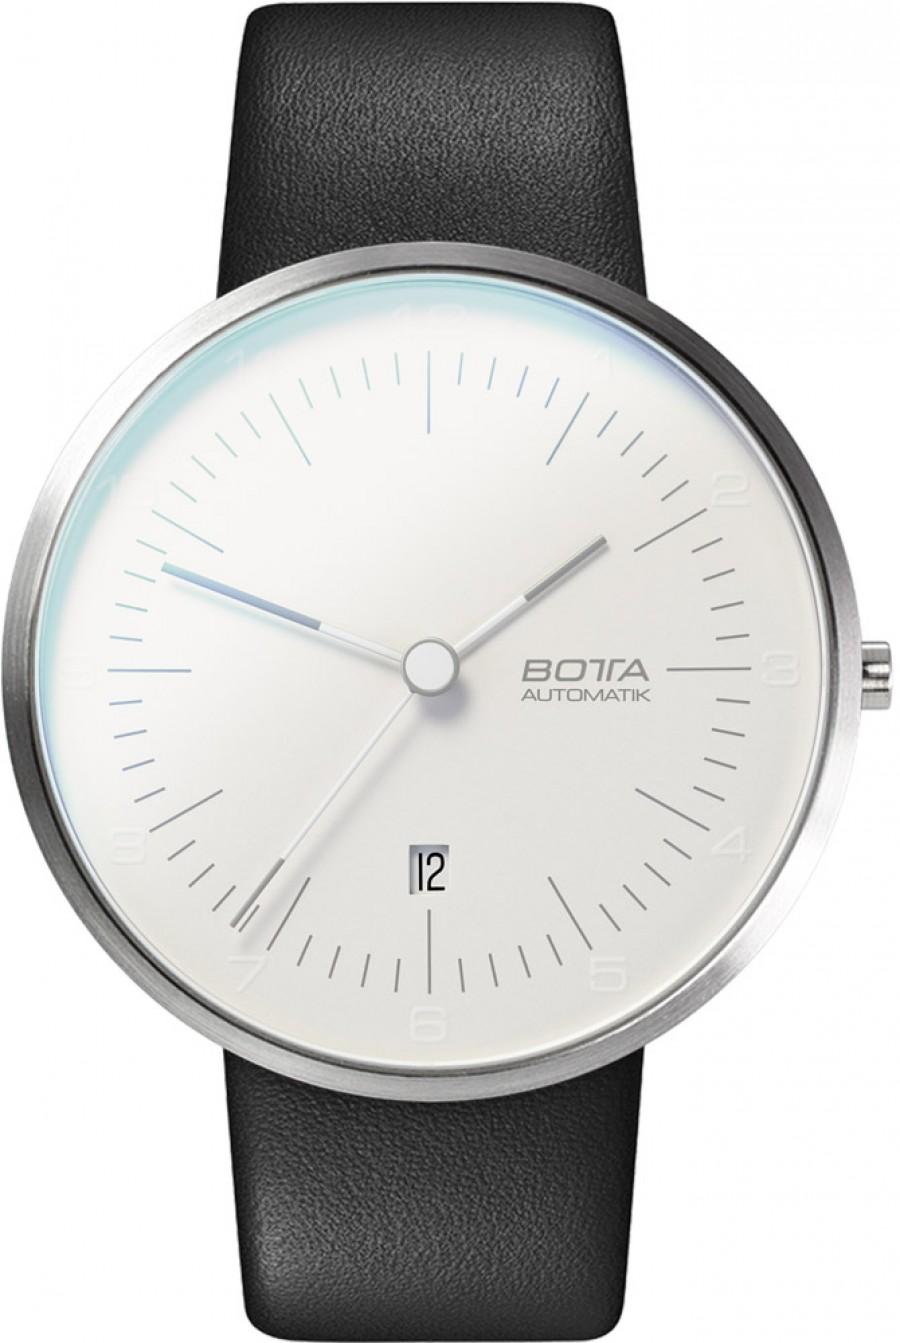 Botta Design tres automatic pearl white 44mm